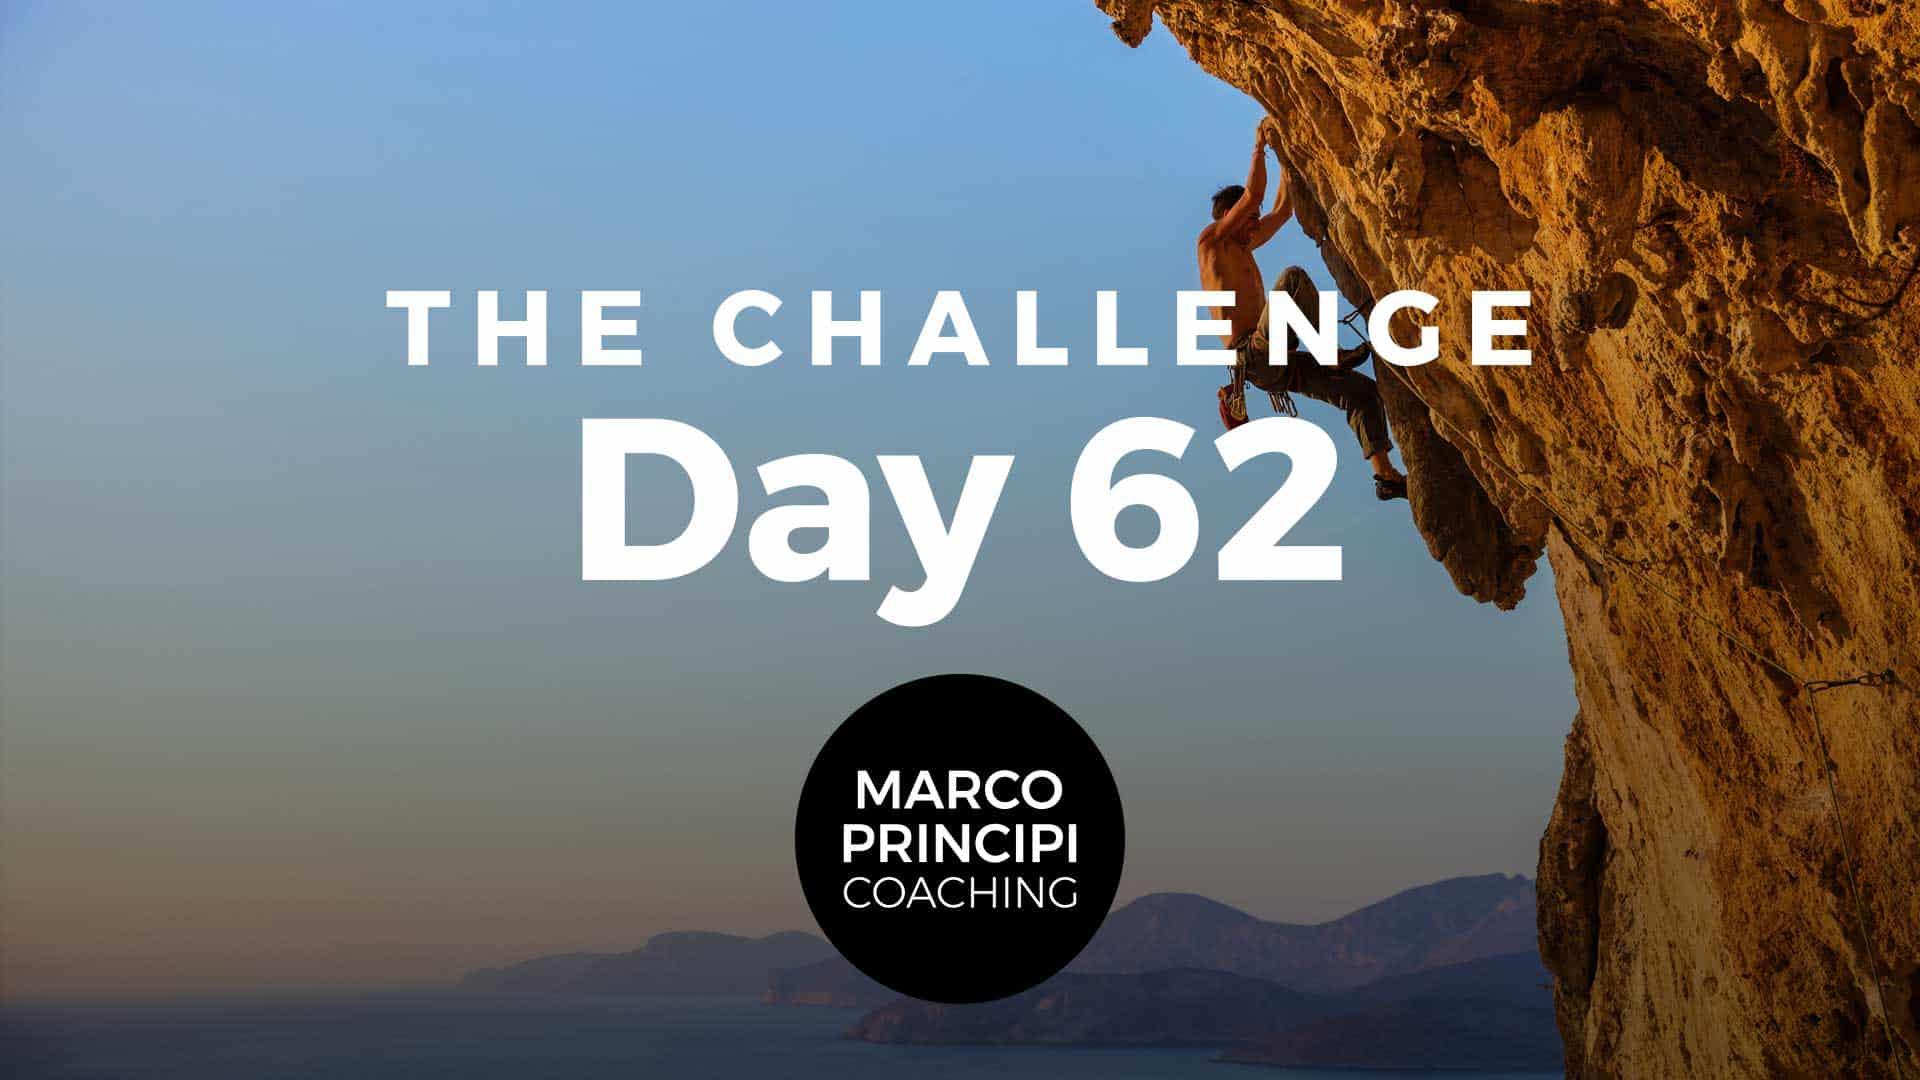 Marco Principi The Challenge Day 62